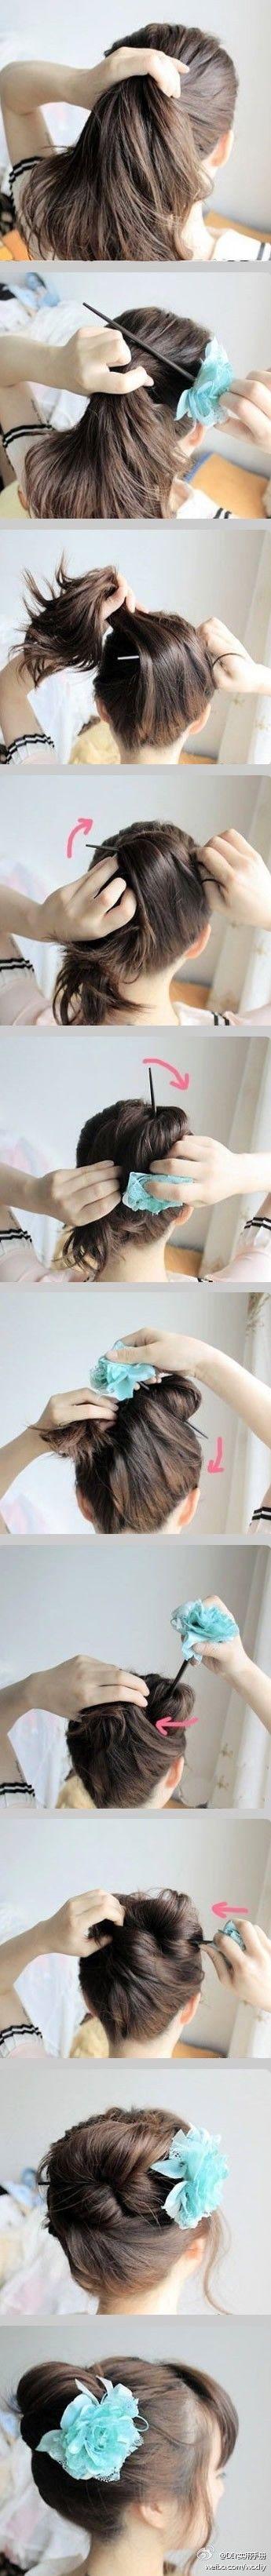 Chopstick hair bun